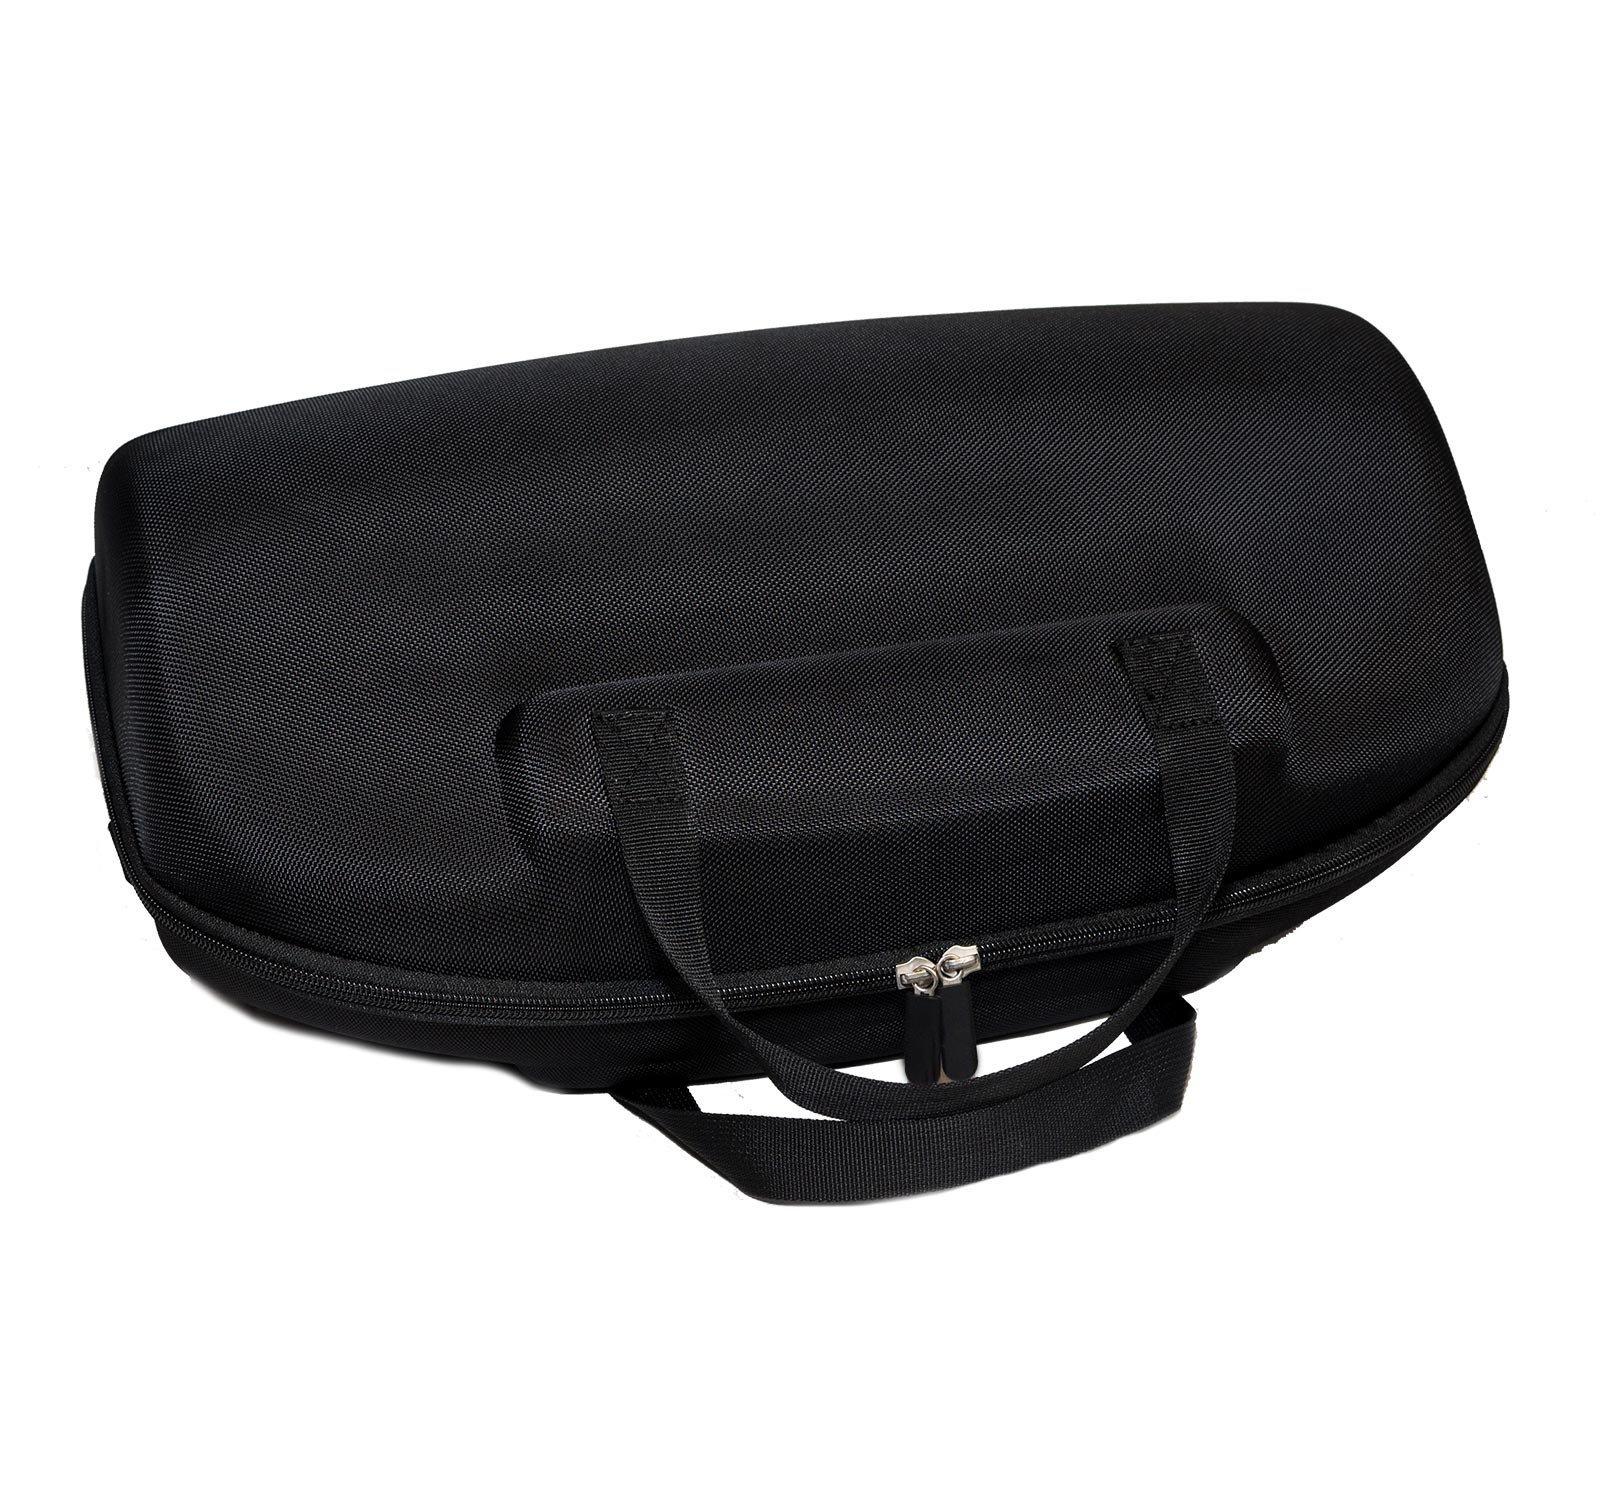 JBL Boombox Portable Bluetooth Waterproof Speaker Bundle with Hardshell Storage Case (Black) by JBL (Image #6)